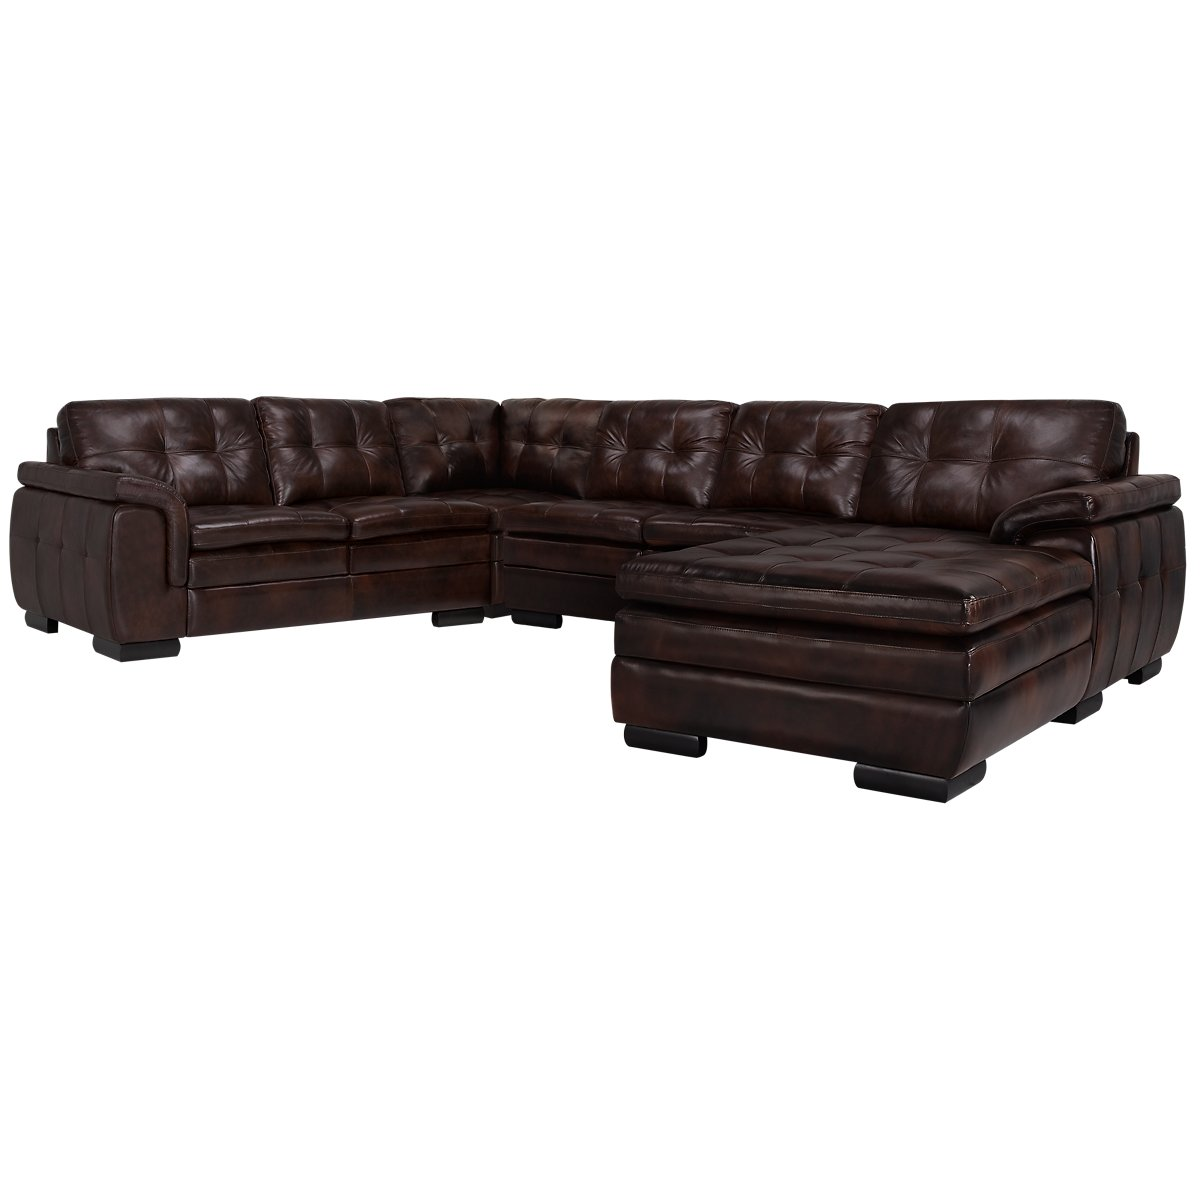 City Furniture Trevor Dark Brown Leather Small Right